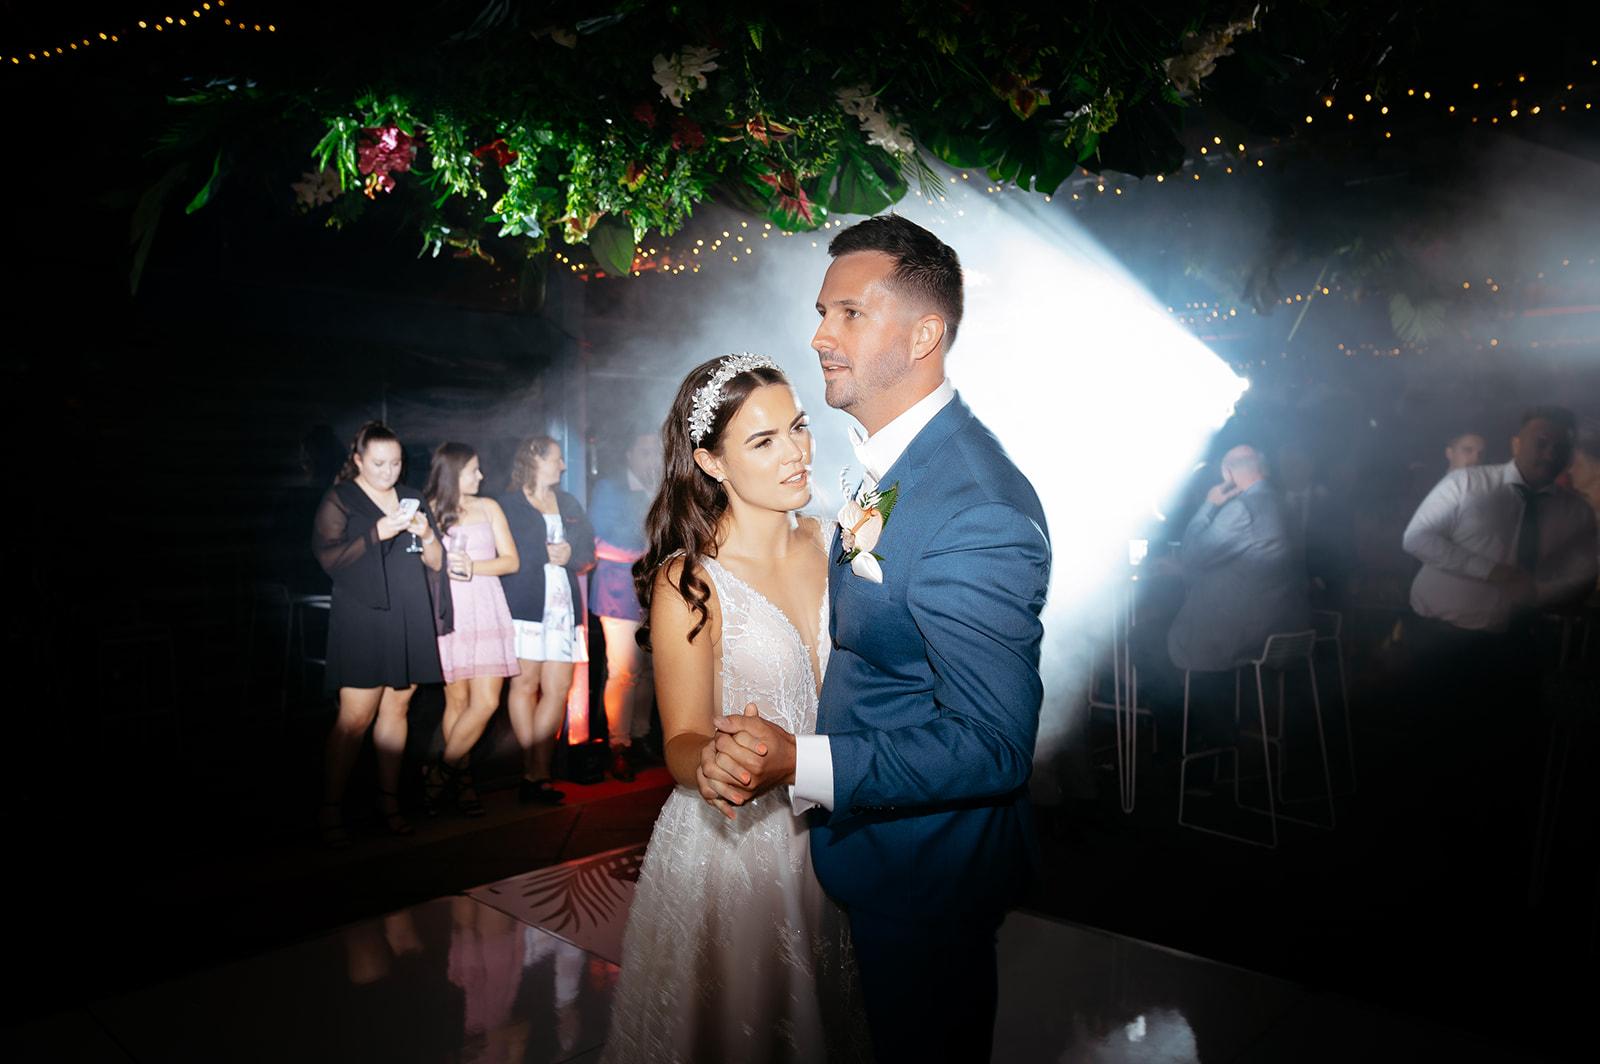 Emma & BJ's Wedding